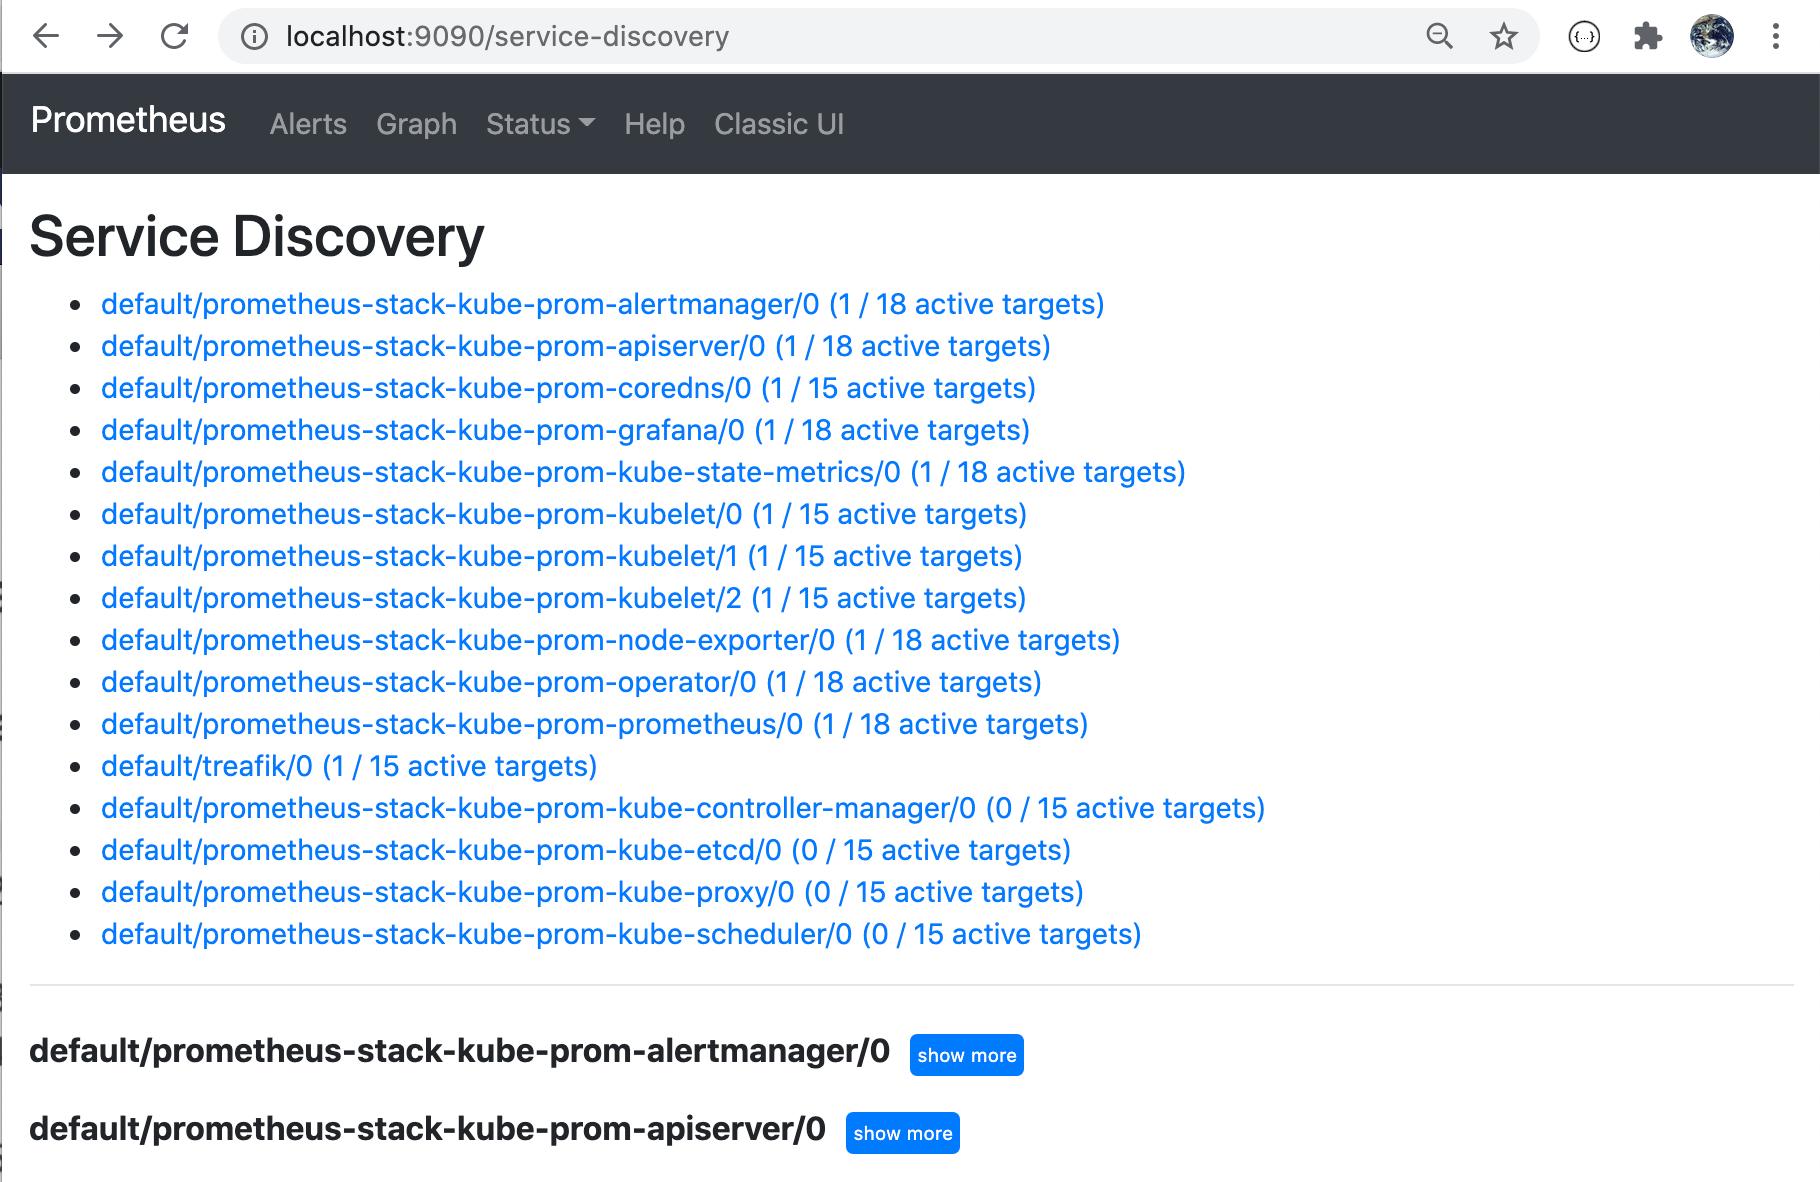 Screenshot of Prometheus Service Discovery dashboard